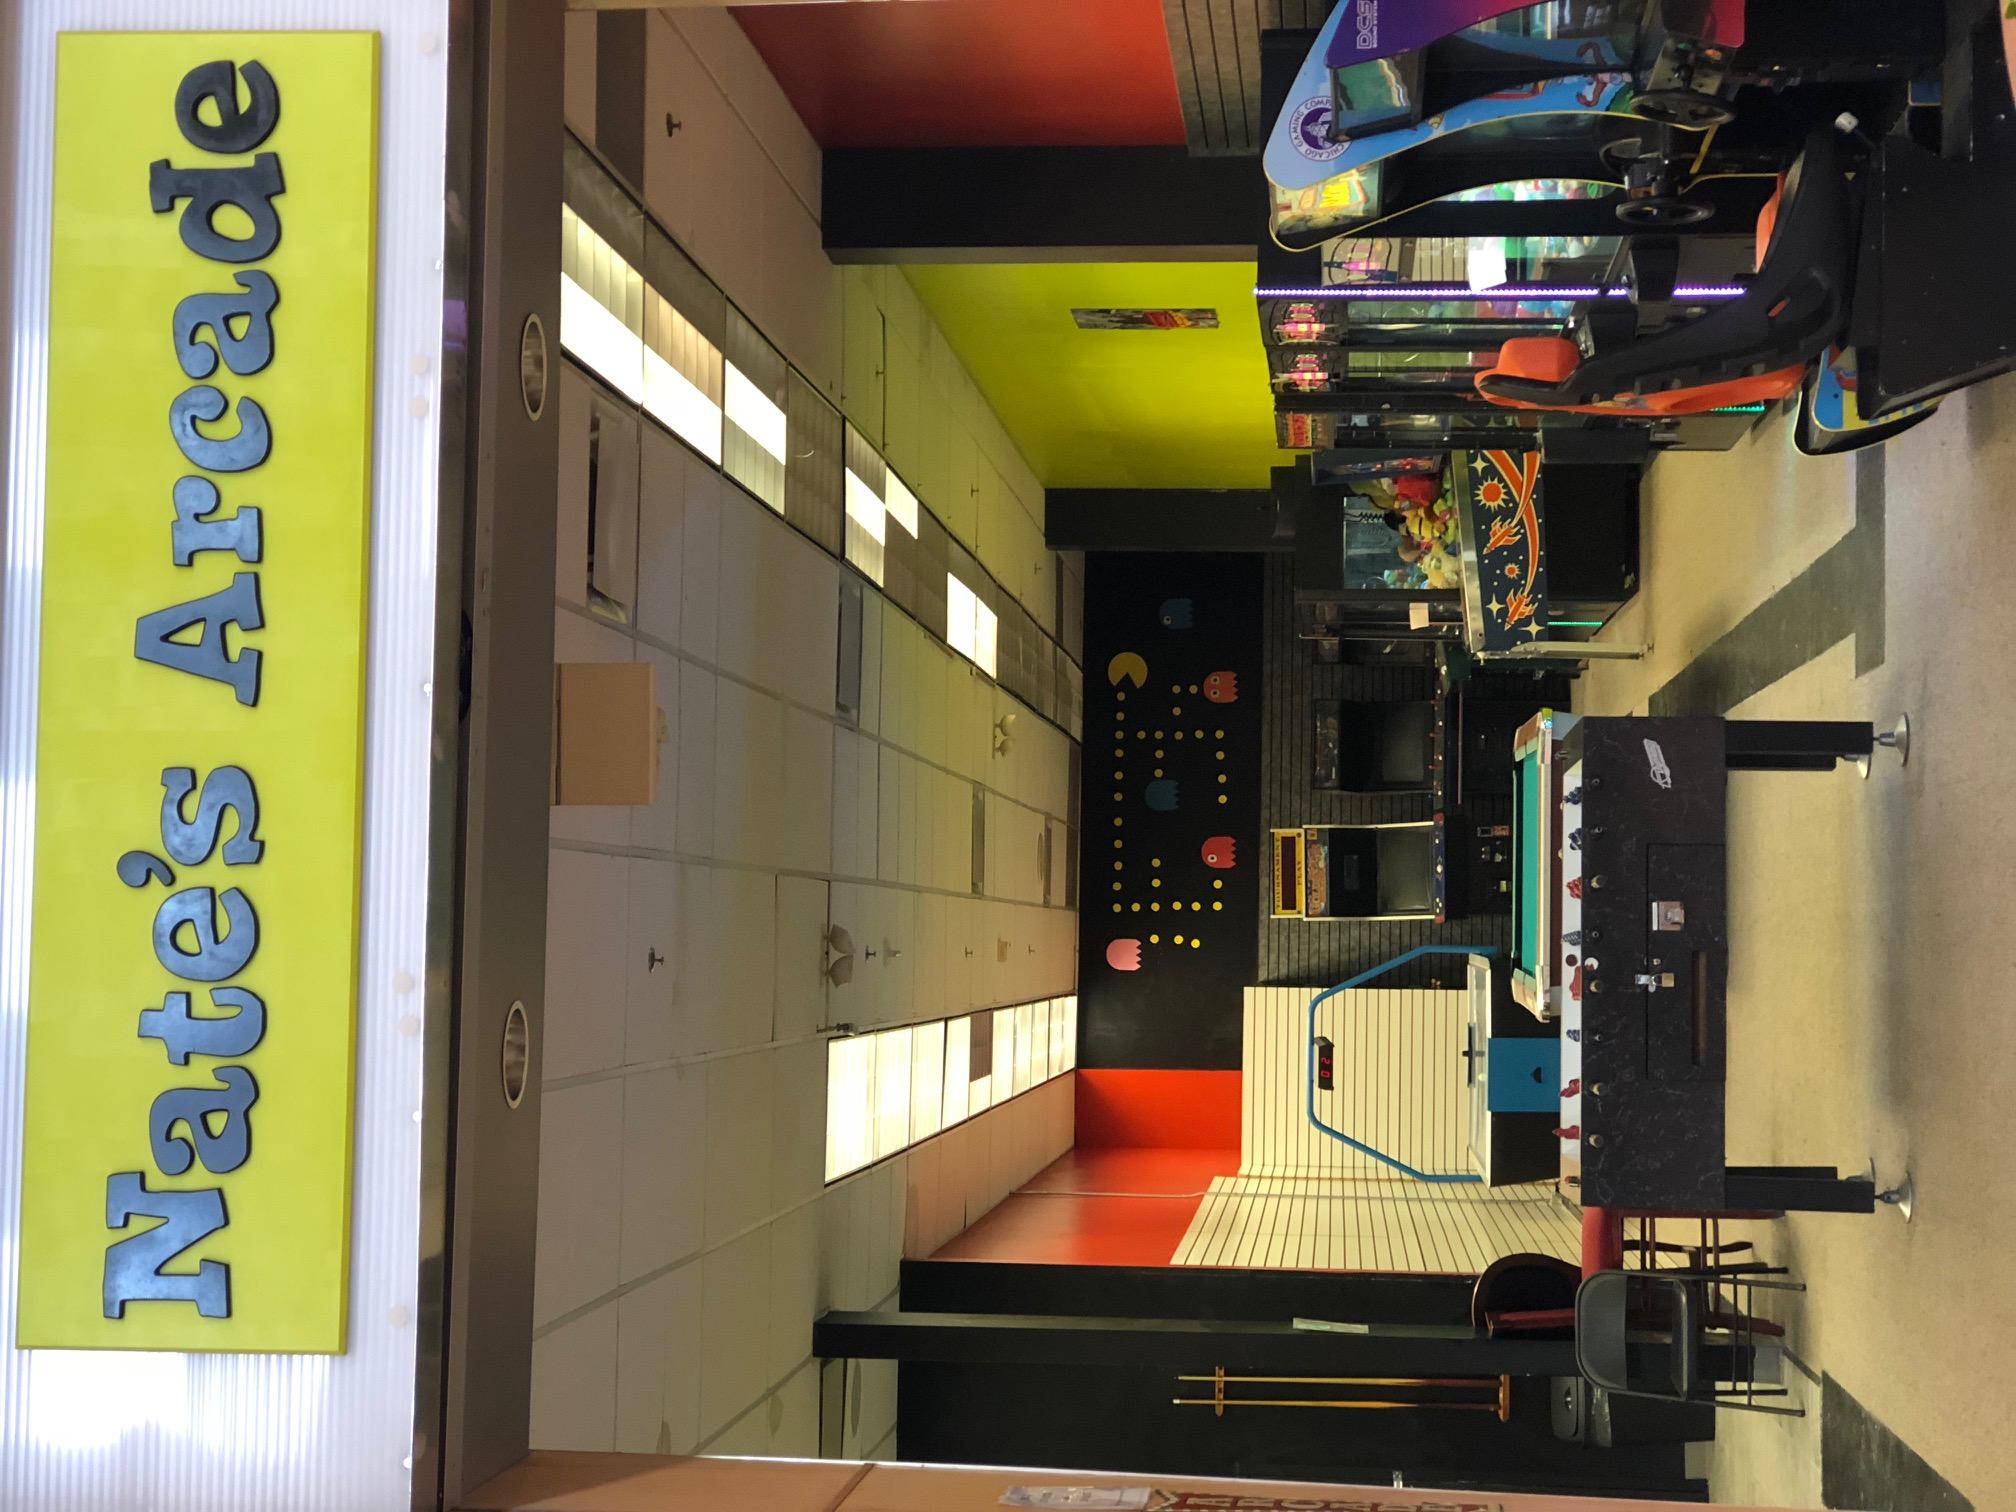 Nate's Arcade